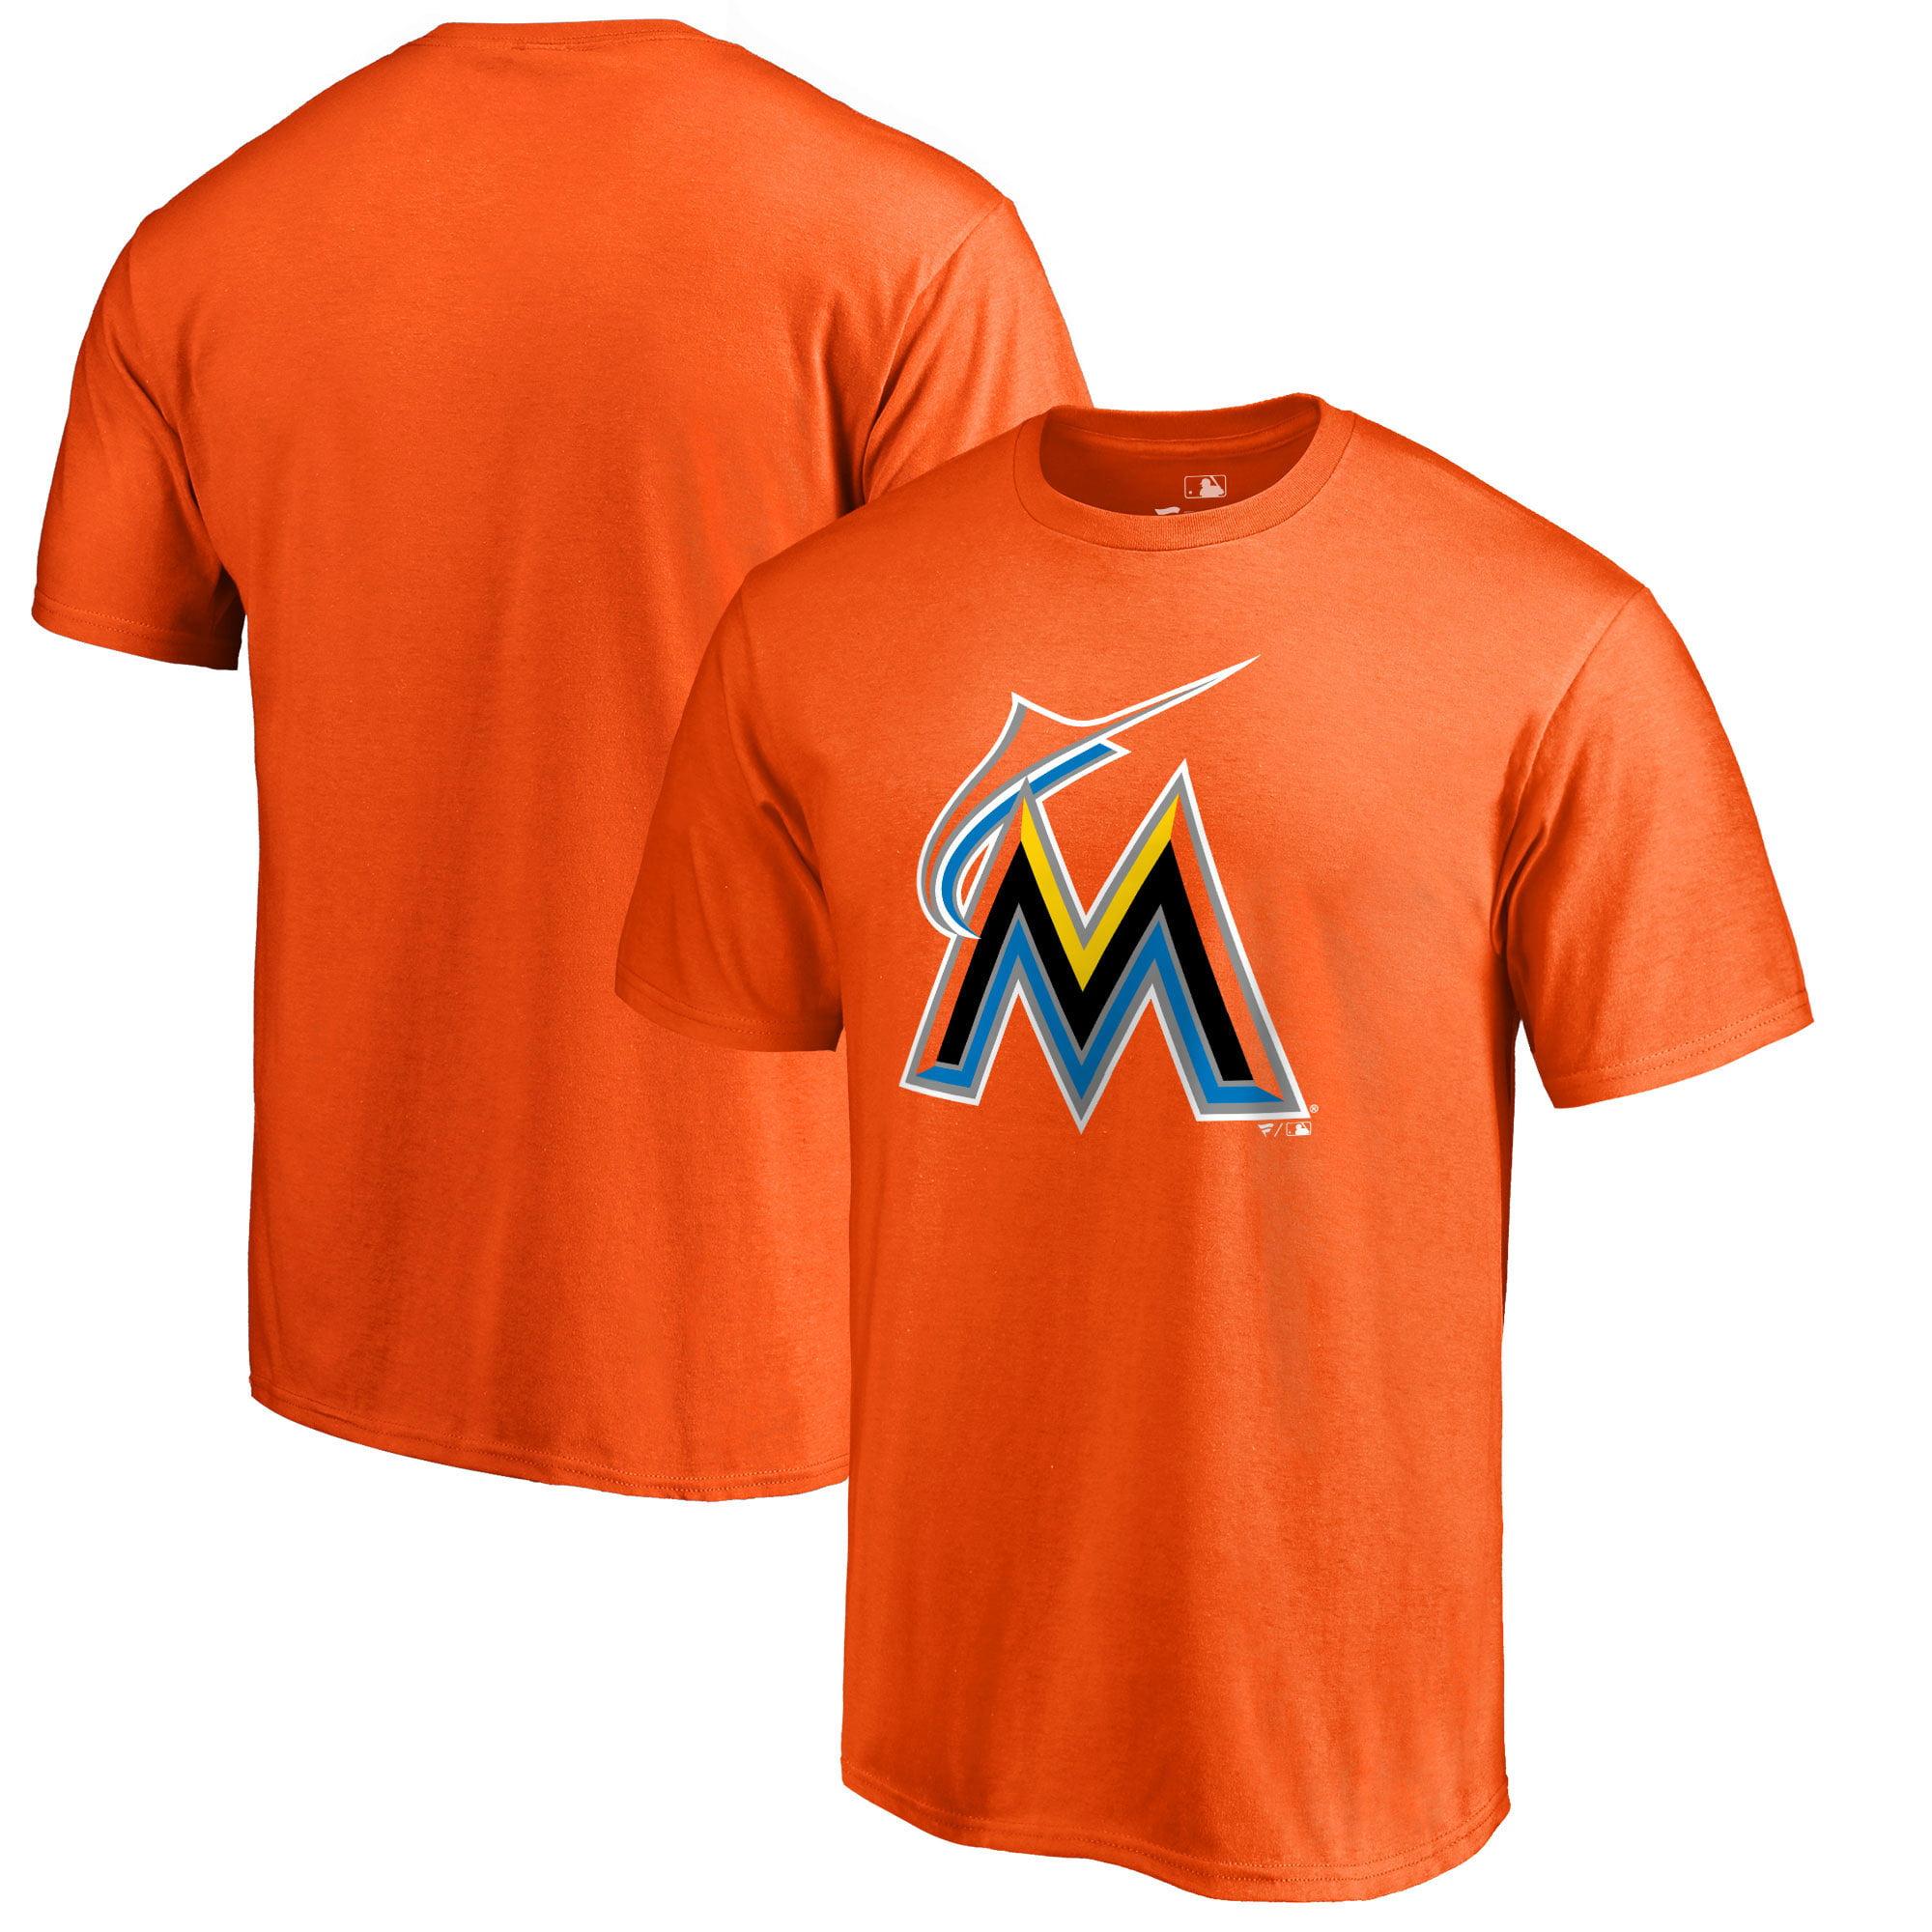 Miami Marlins Fanatics Branded Primary Logo T-Shirt - Orange